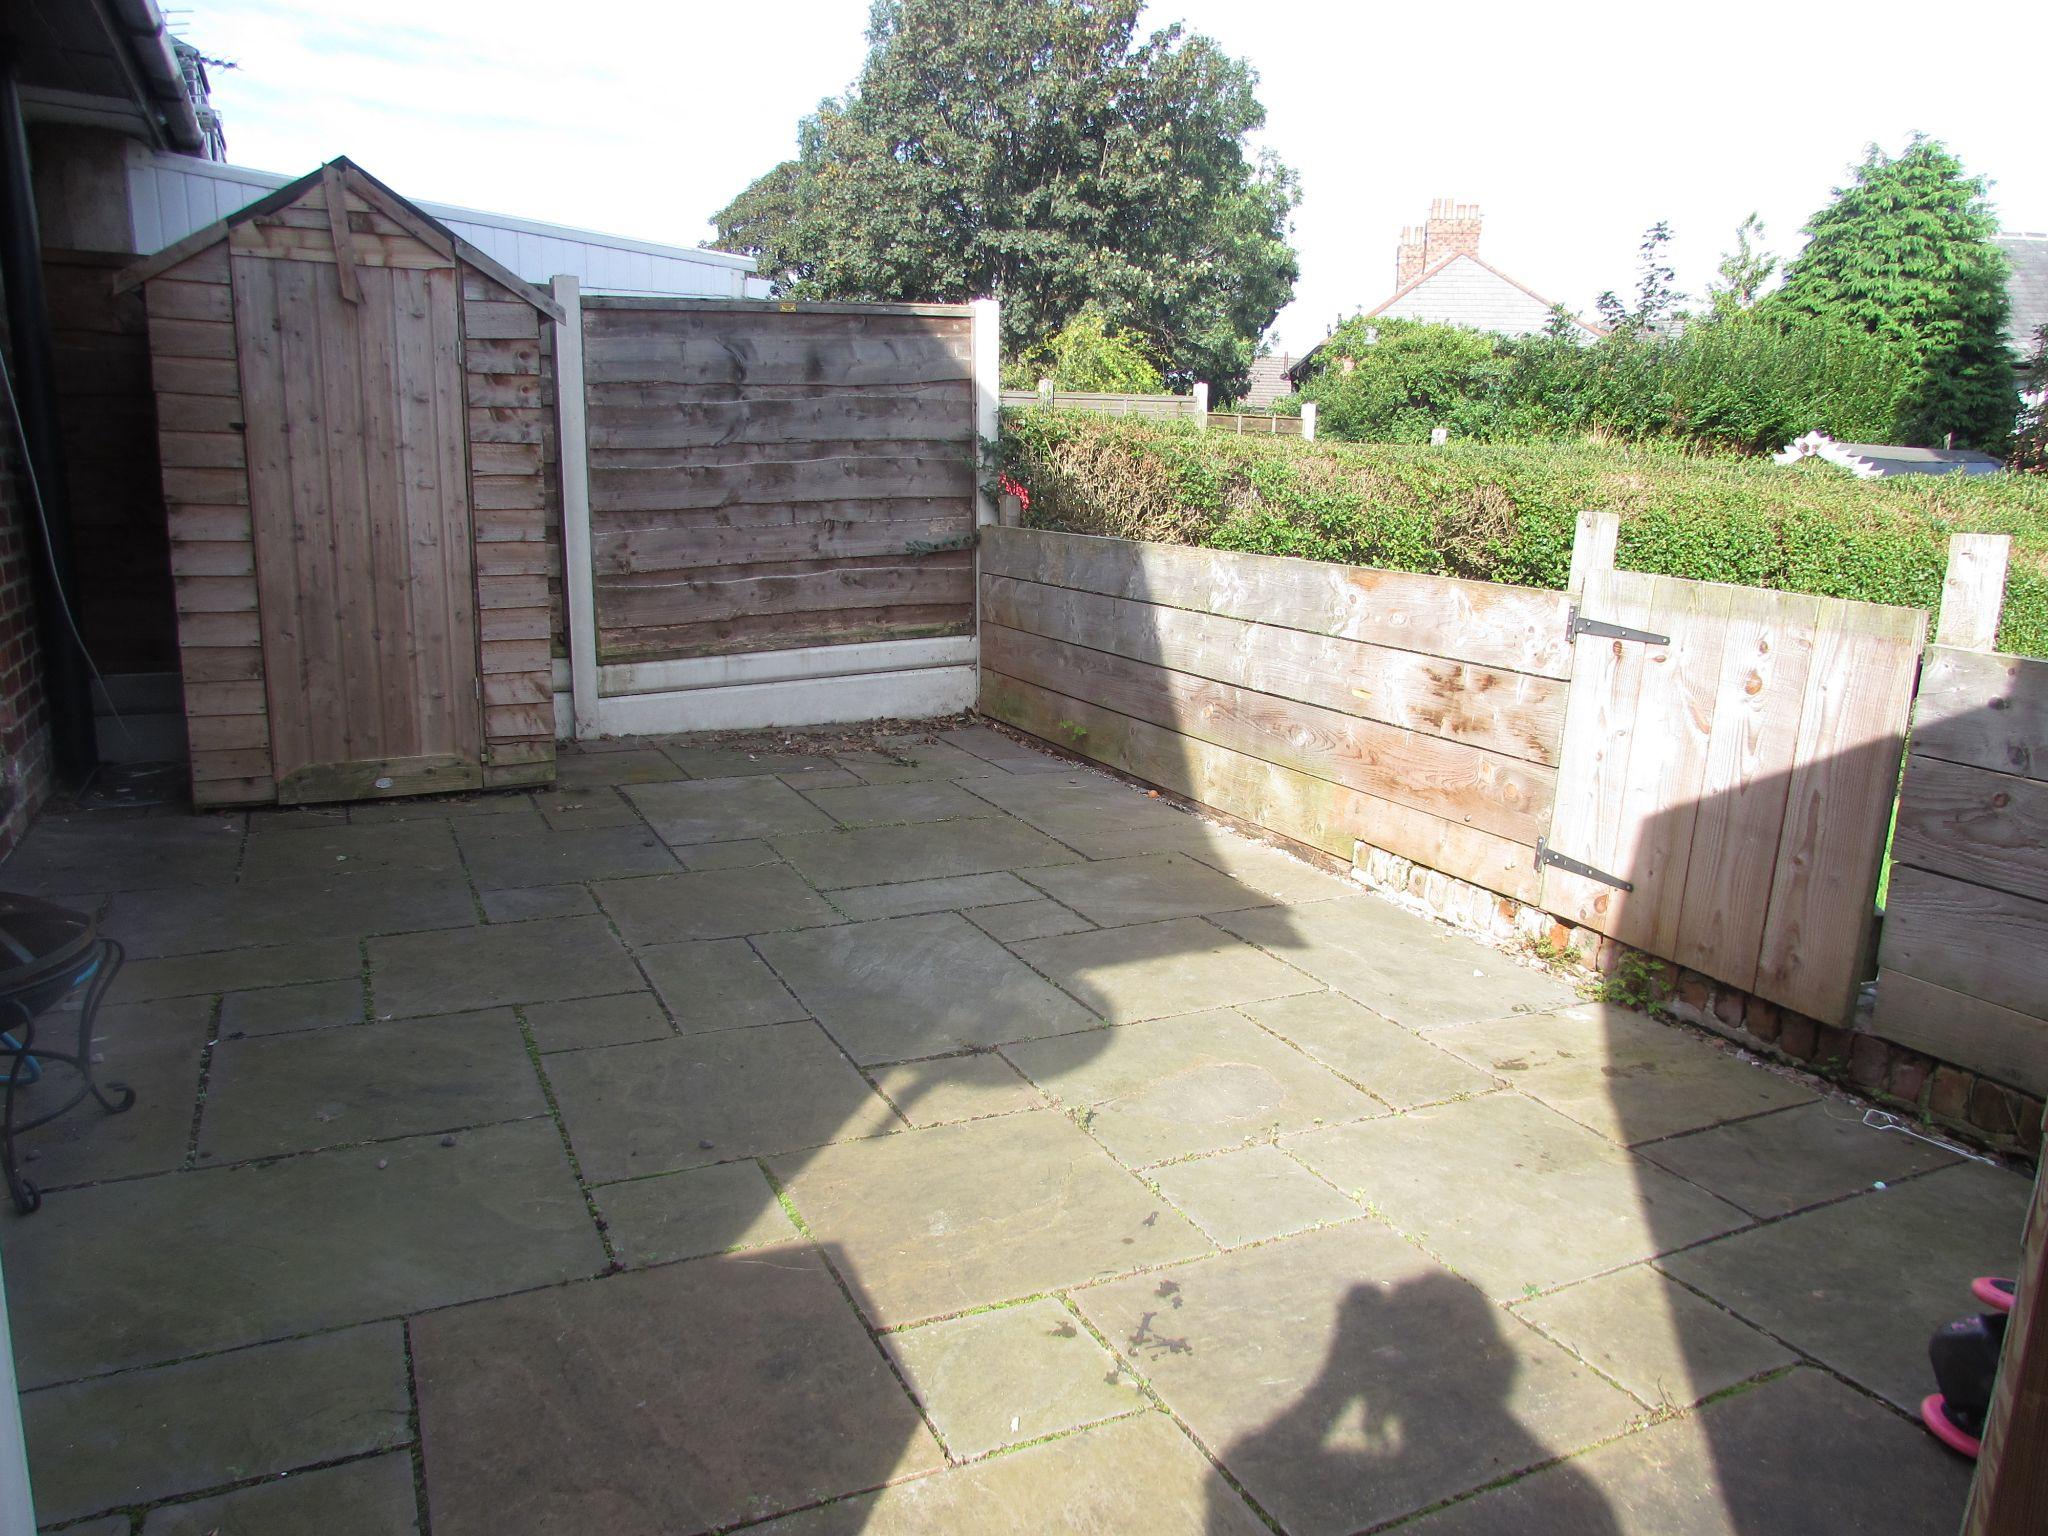 3 Bedroom Semi-detached House For Sale - Patio Area